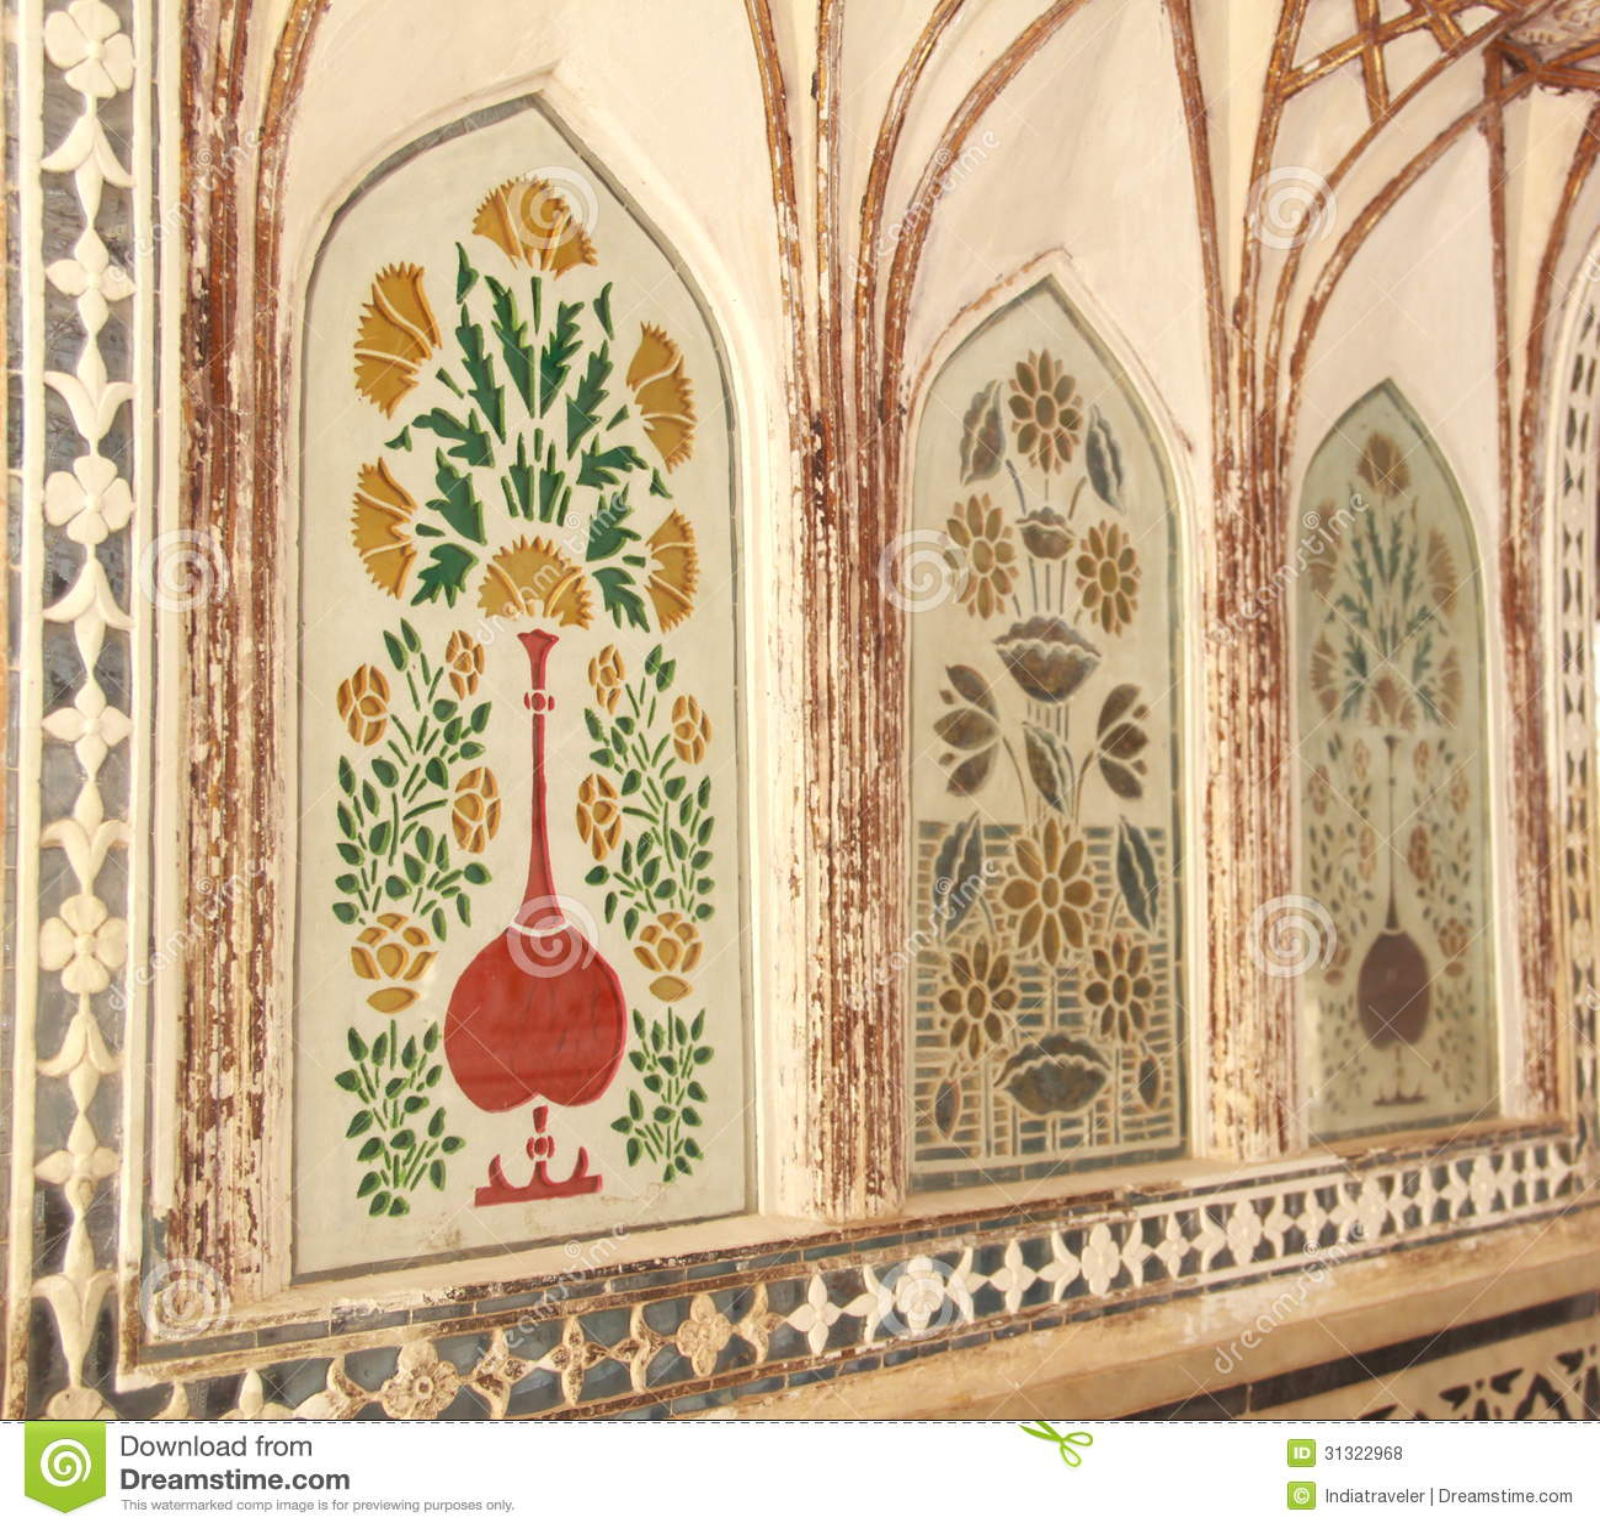 Art Wall Painting Jaipur